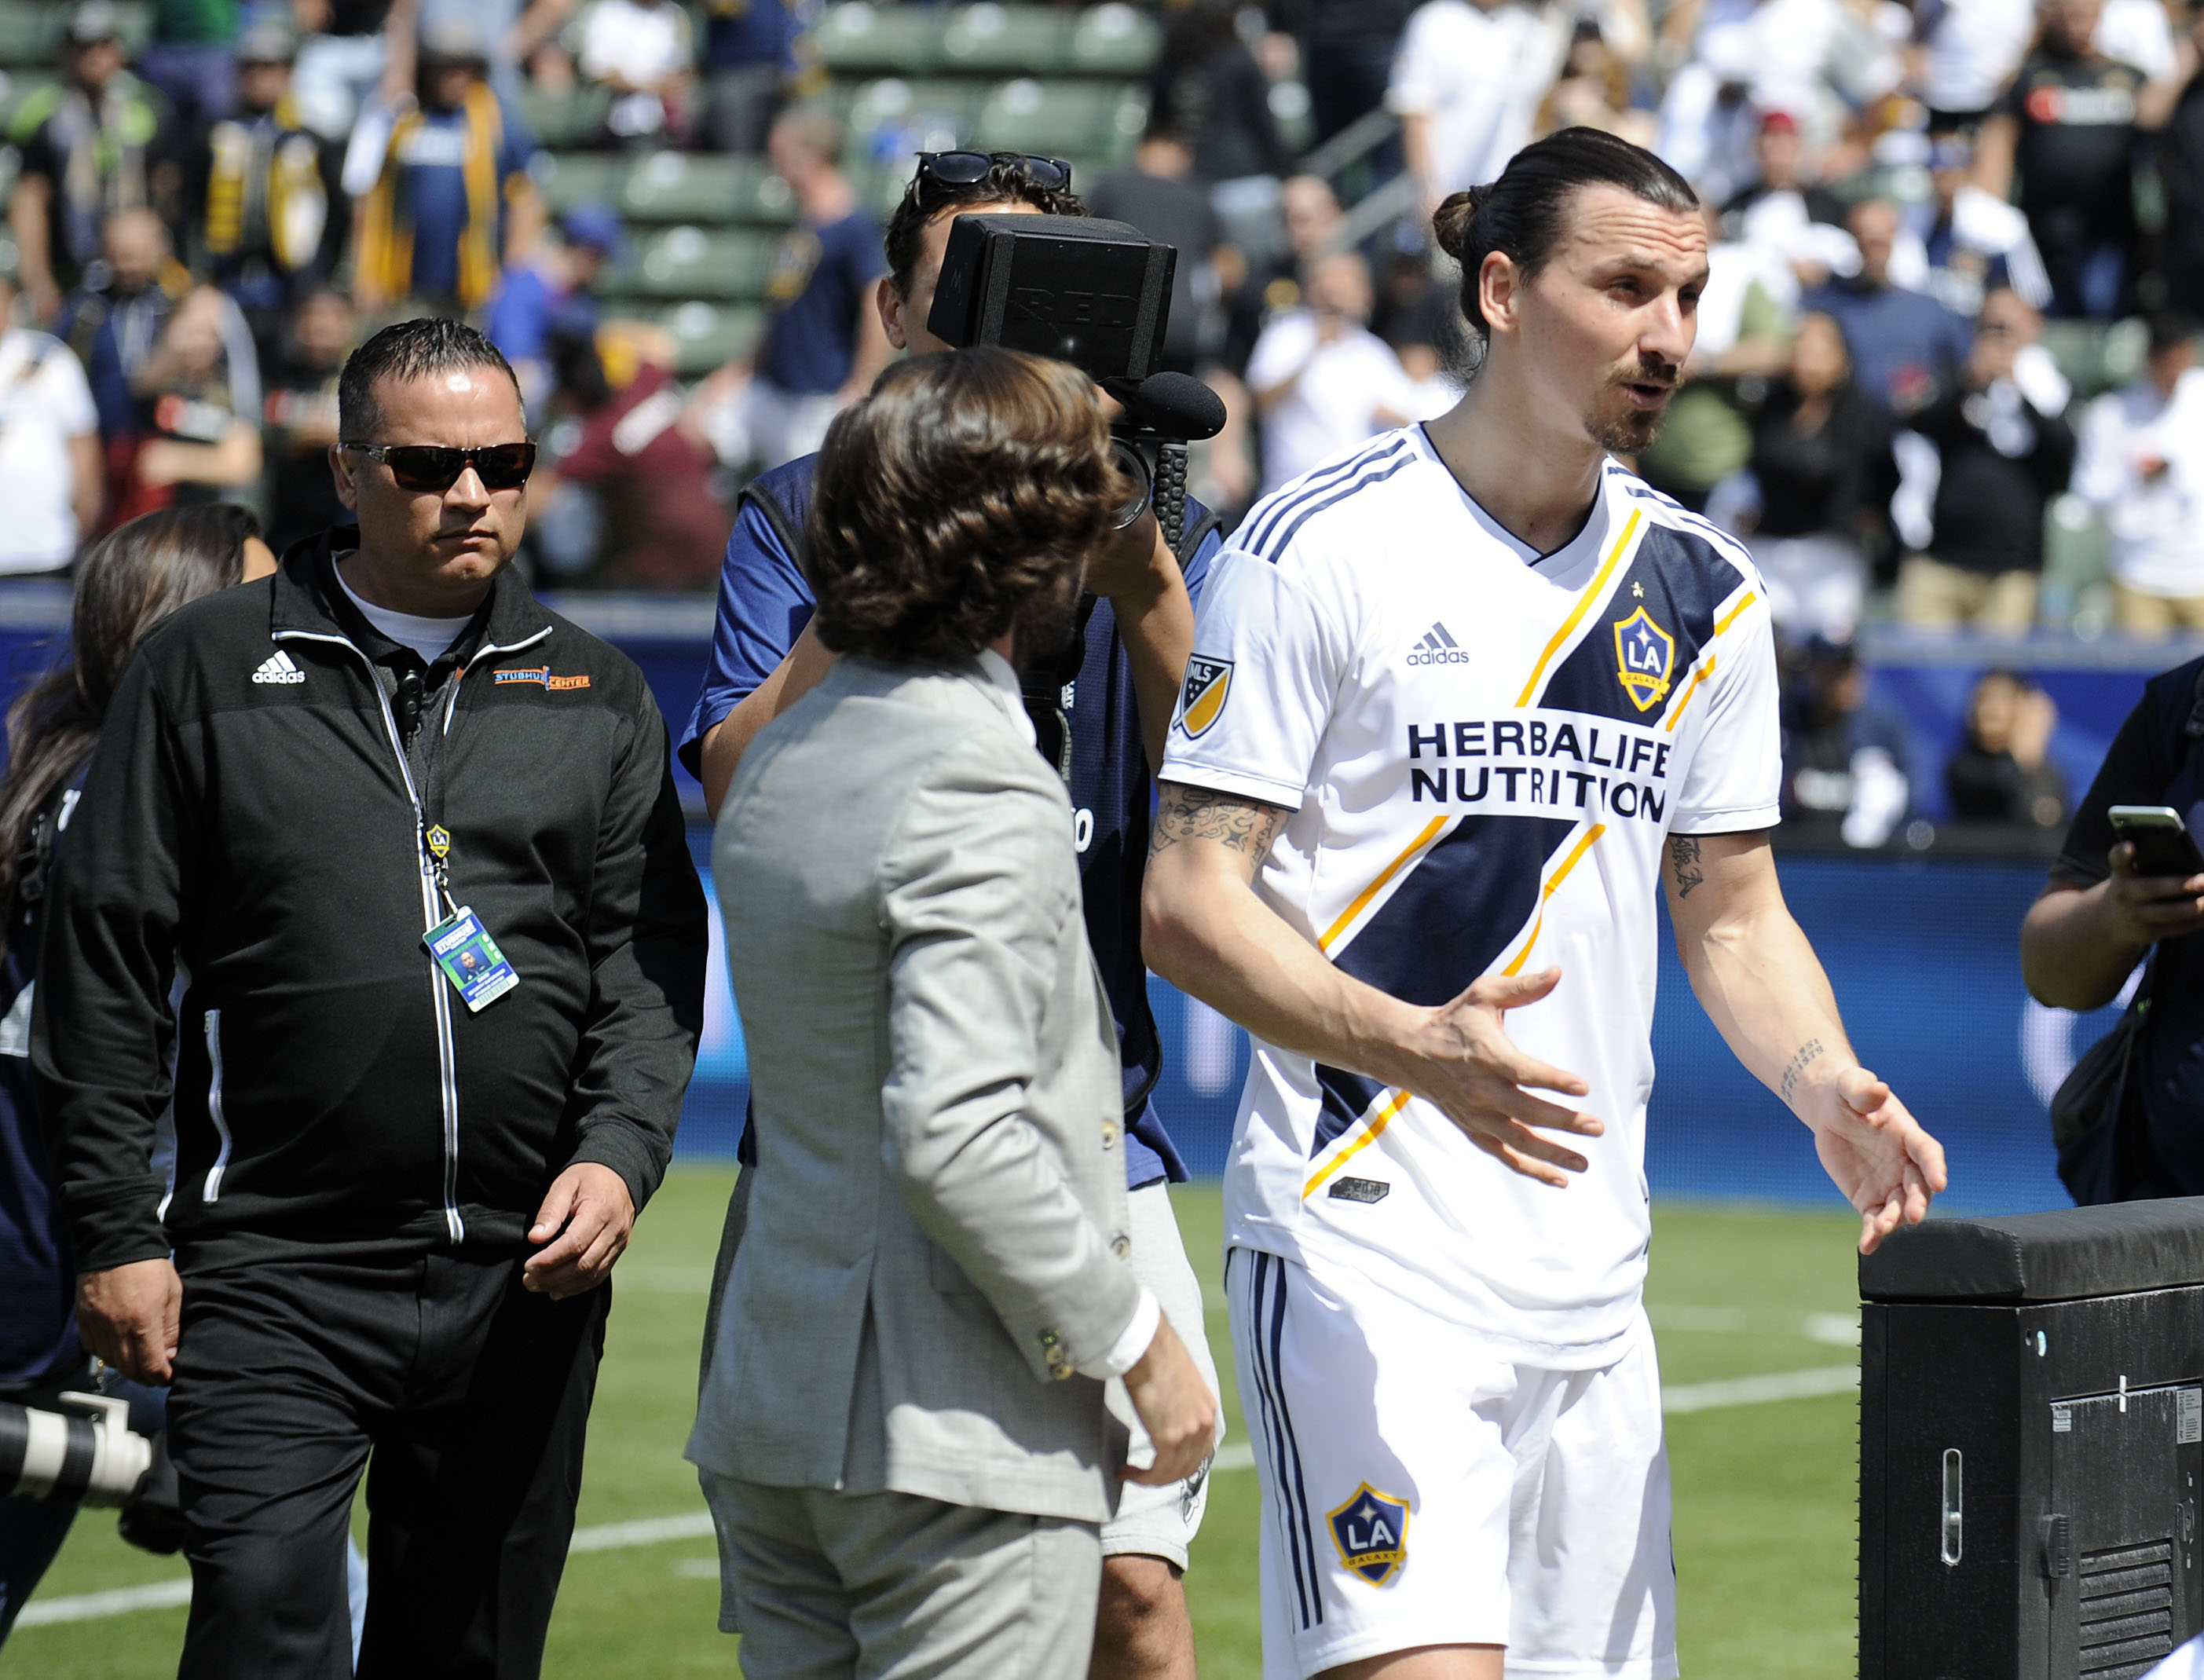 cceceb2da1a Watch: Zlatan Ibrahimovic scores brace on LA Galaxy debut